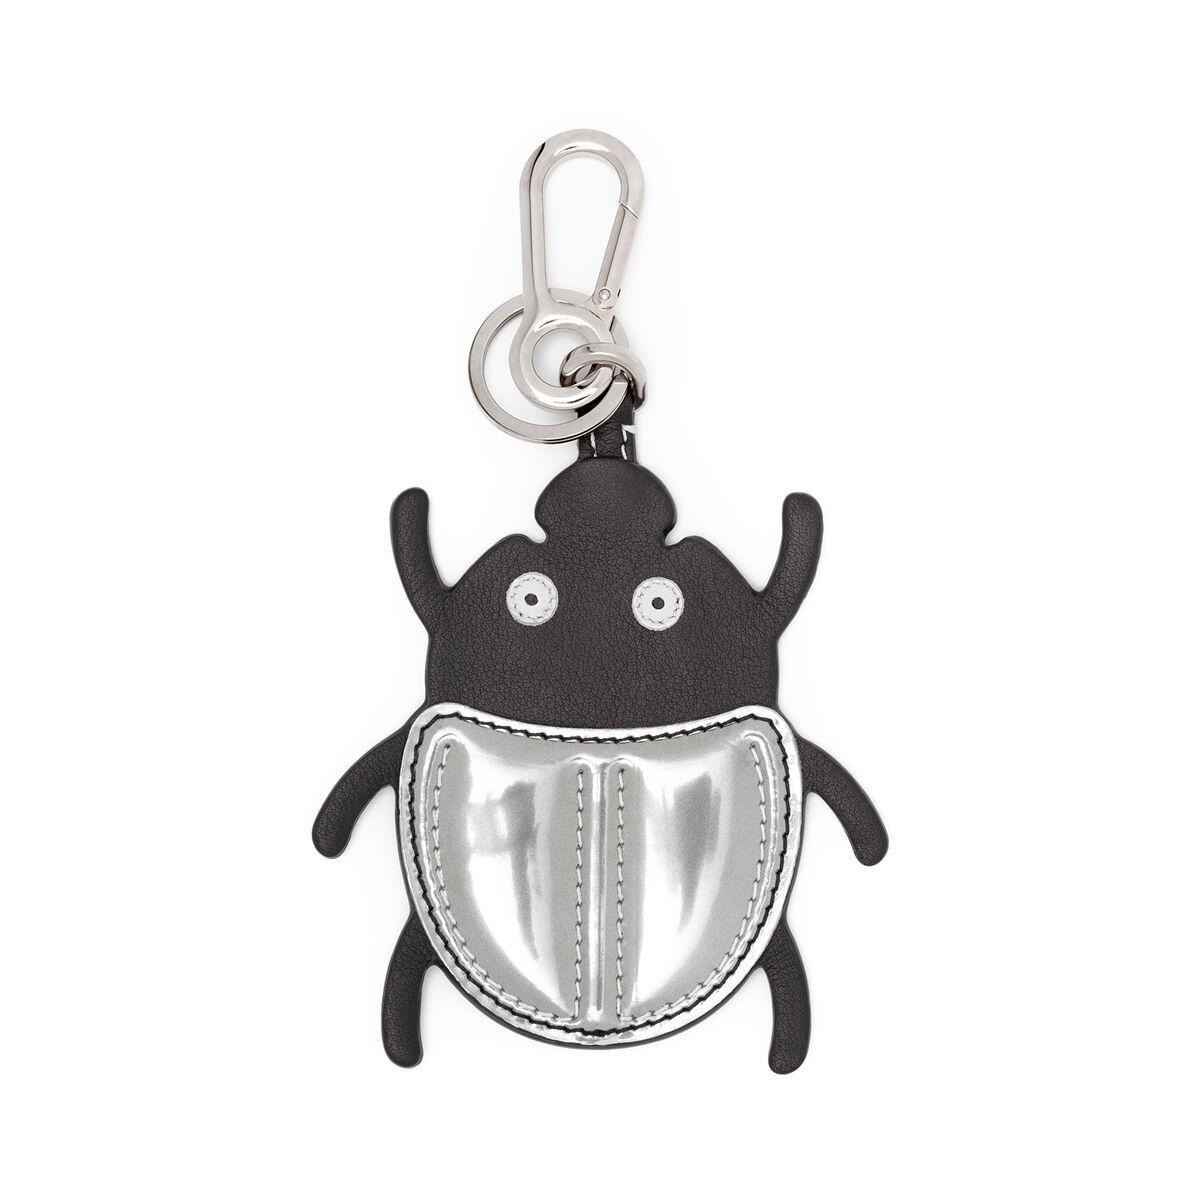 LOEWE Charm Escarabajo Negro/Plata all